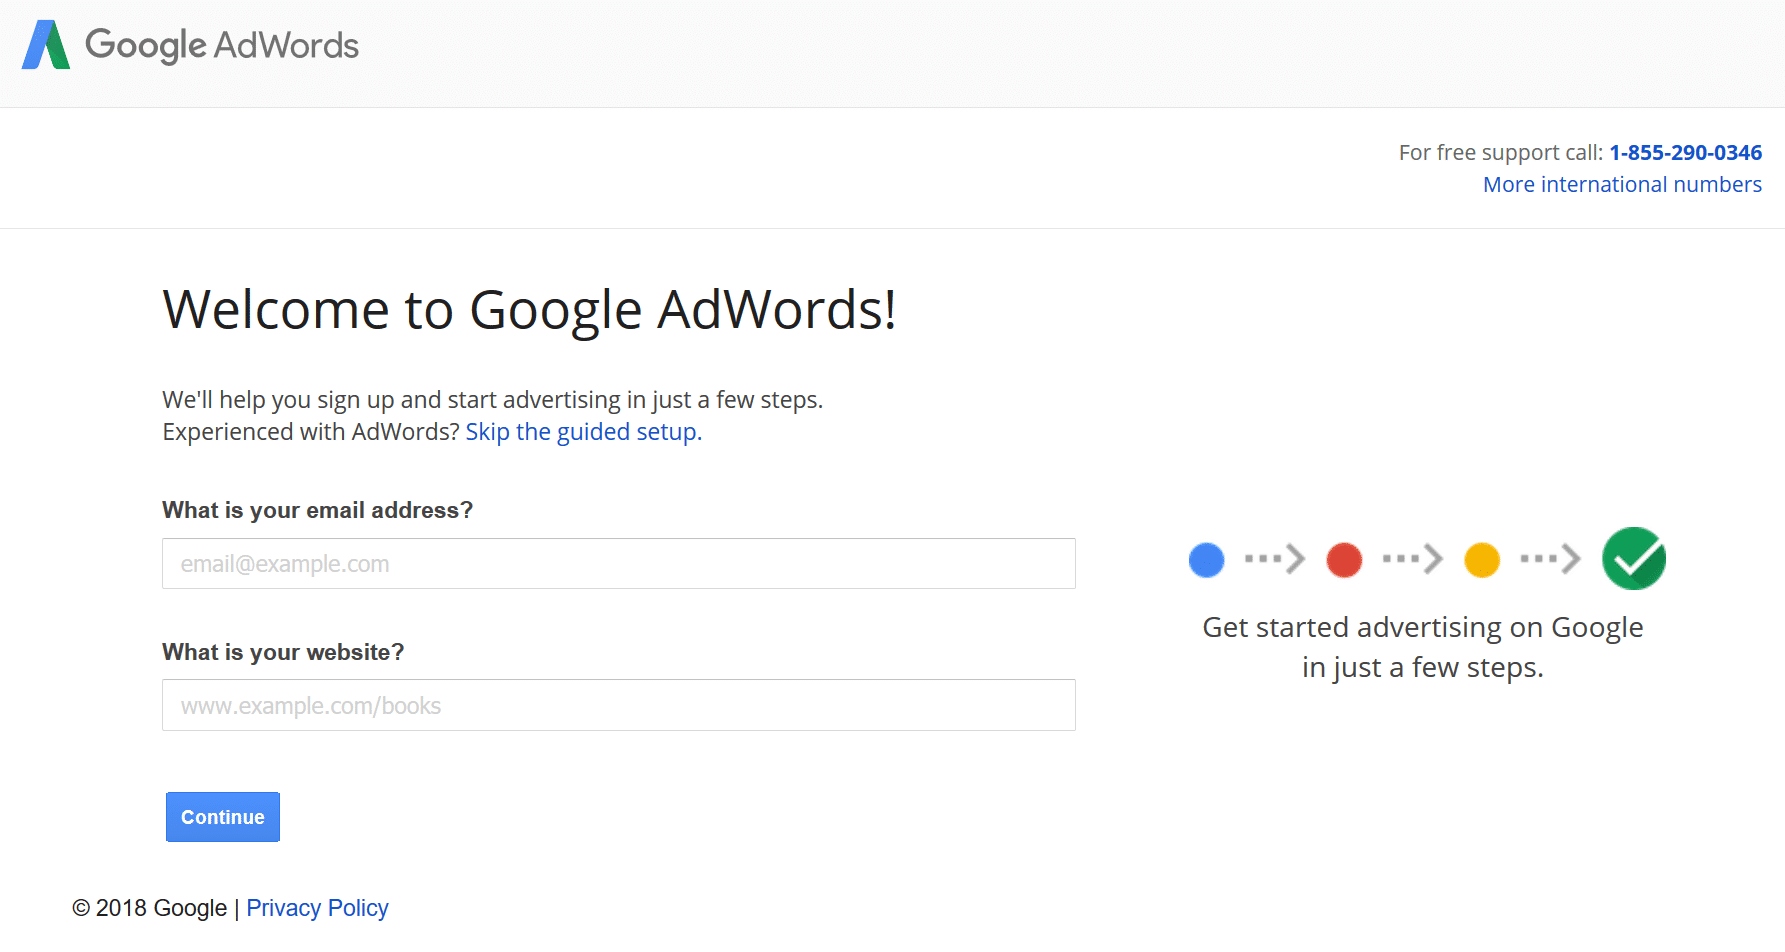 Inscríbase a Google AdWords